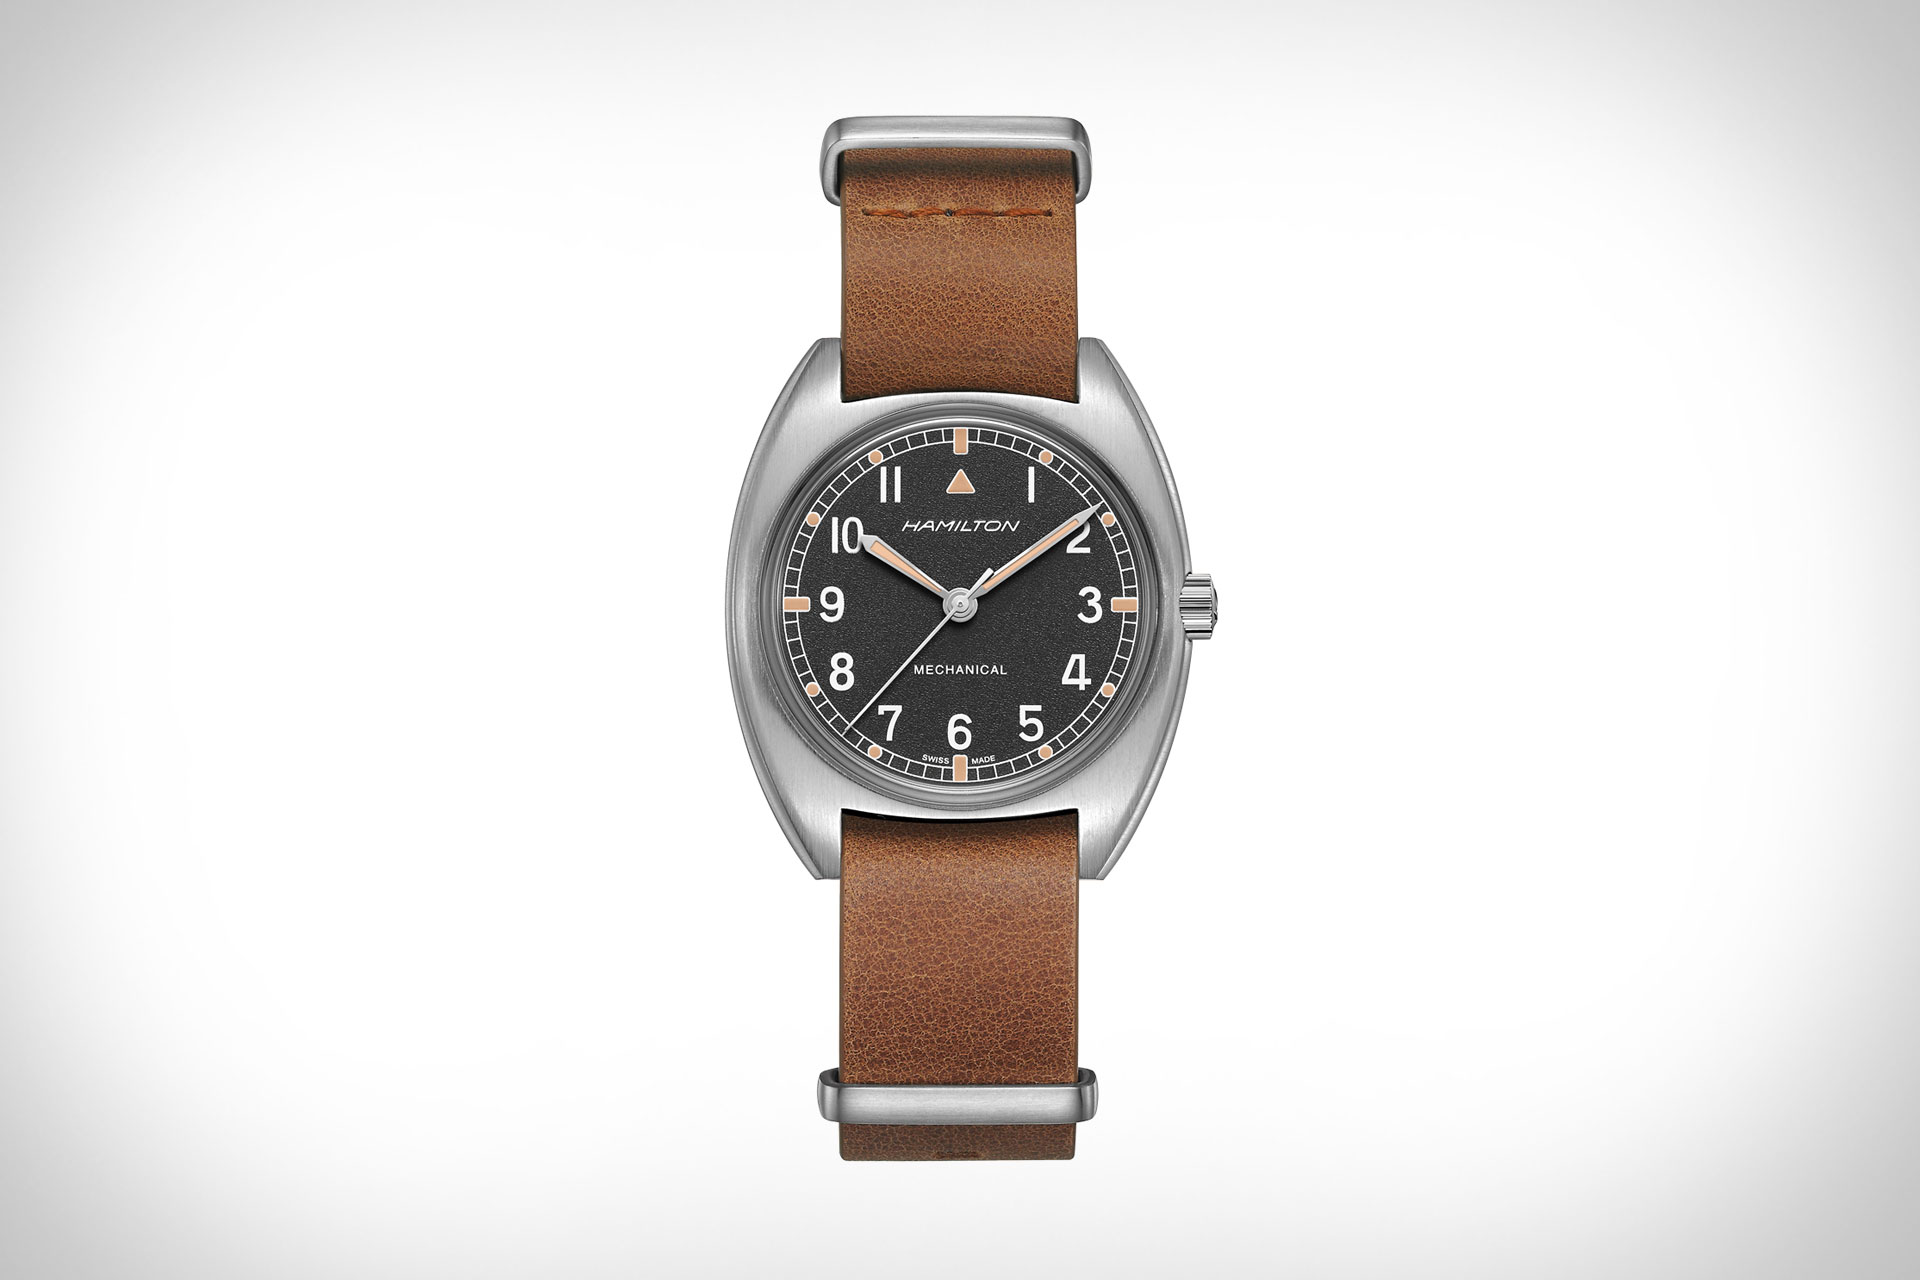 Hamilton Khaki Pilot Pioneer Mechanical Watch